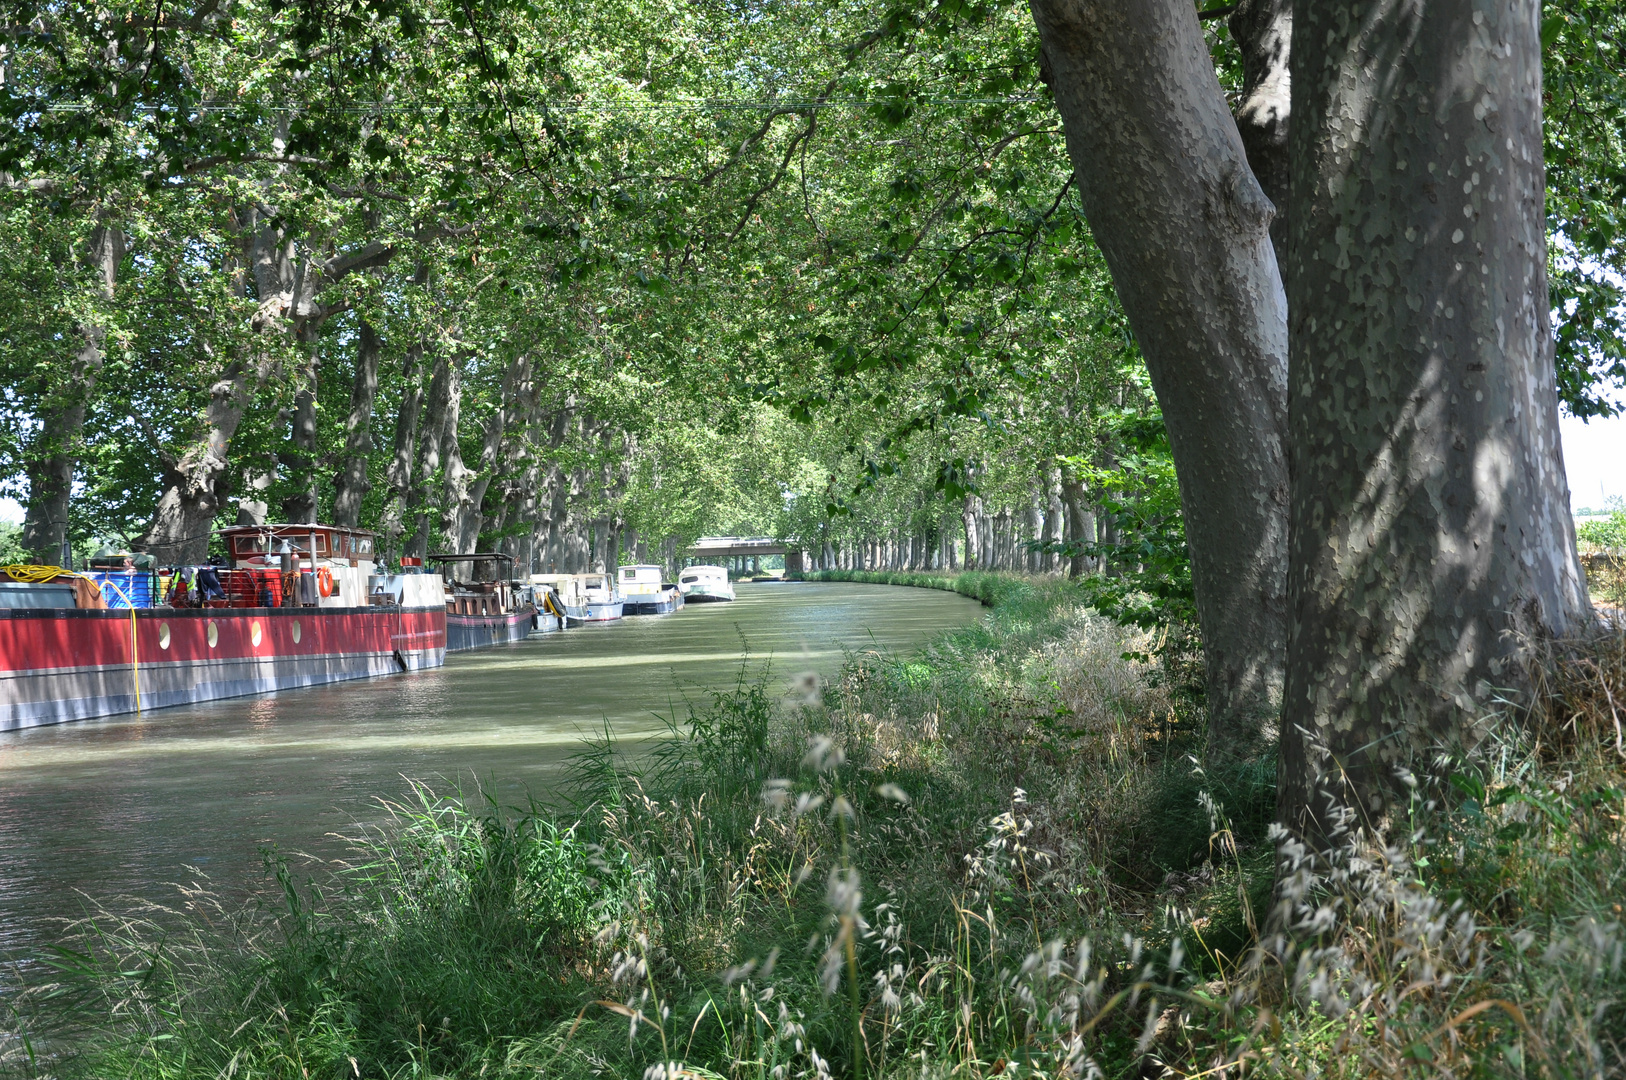 Canal de Midi ( Südfrankreich bei Beziers)